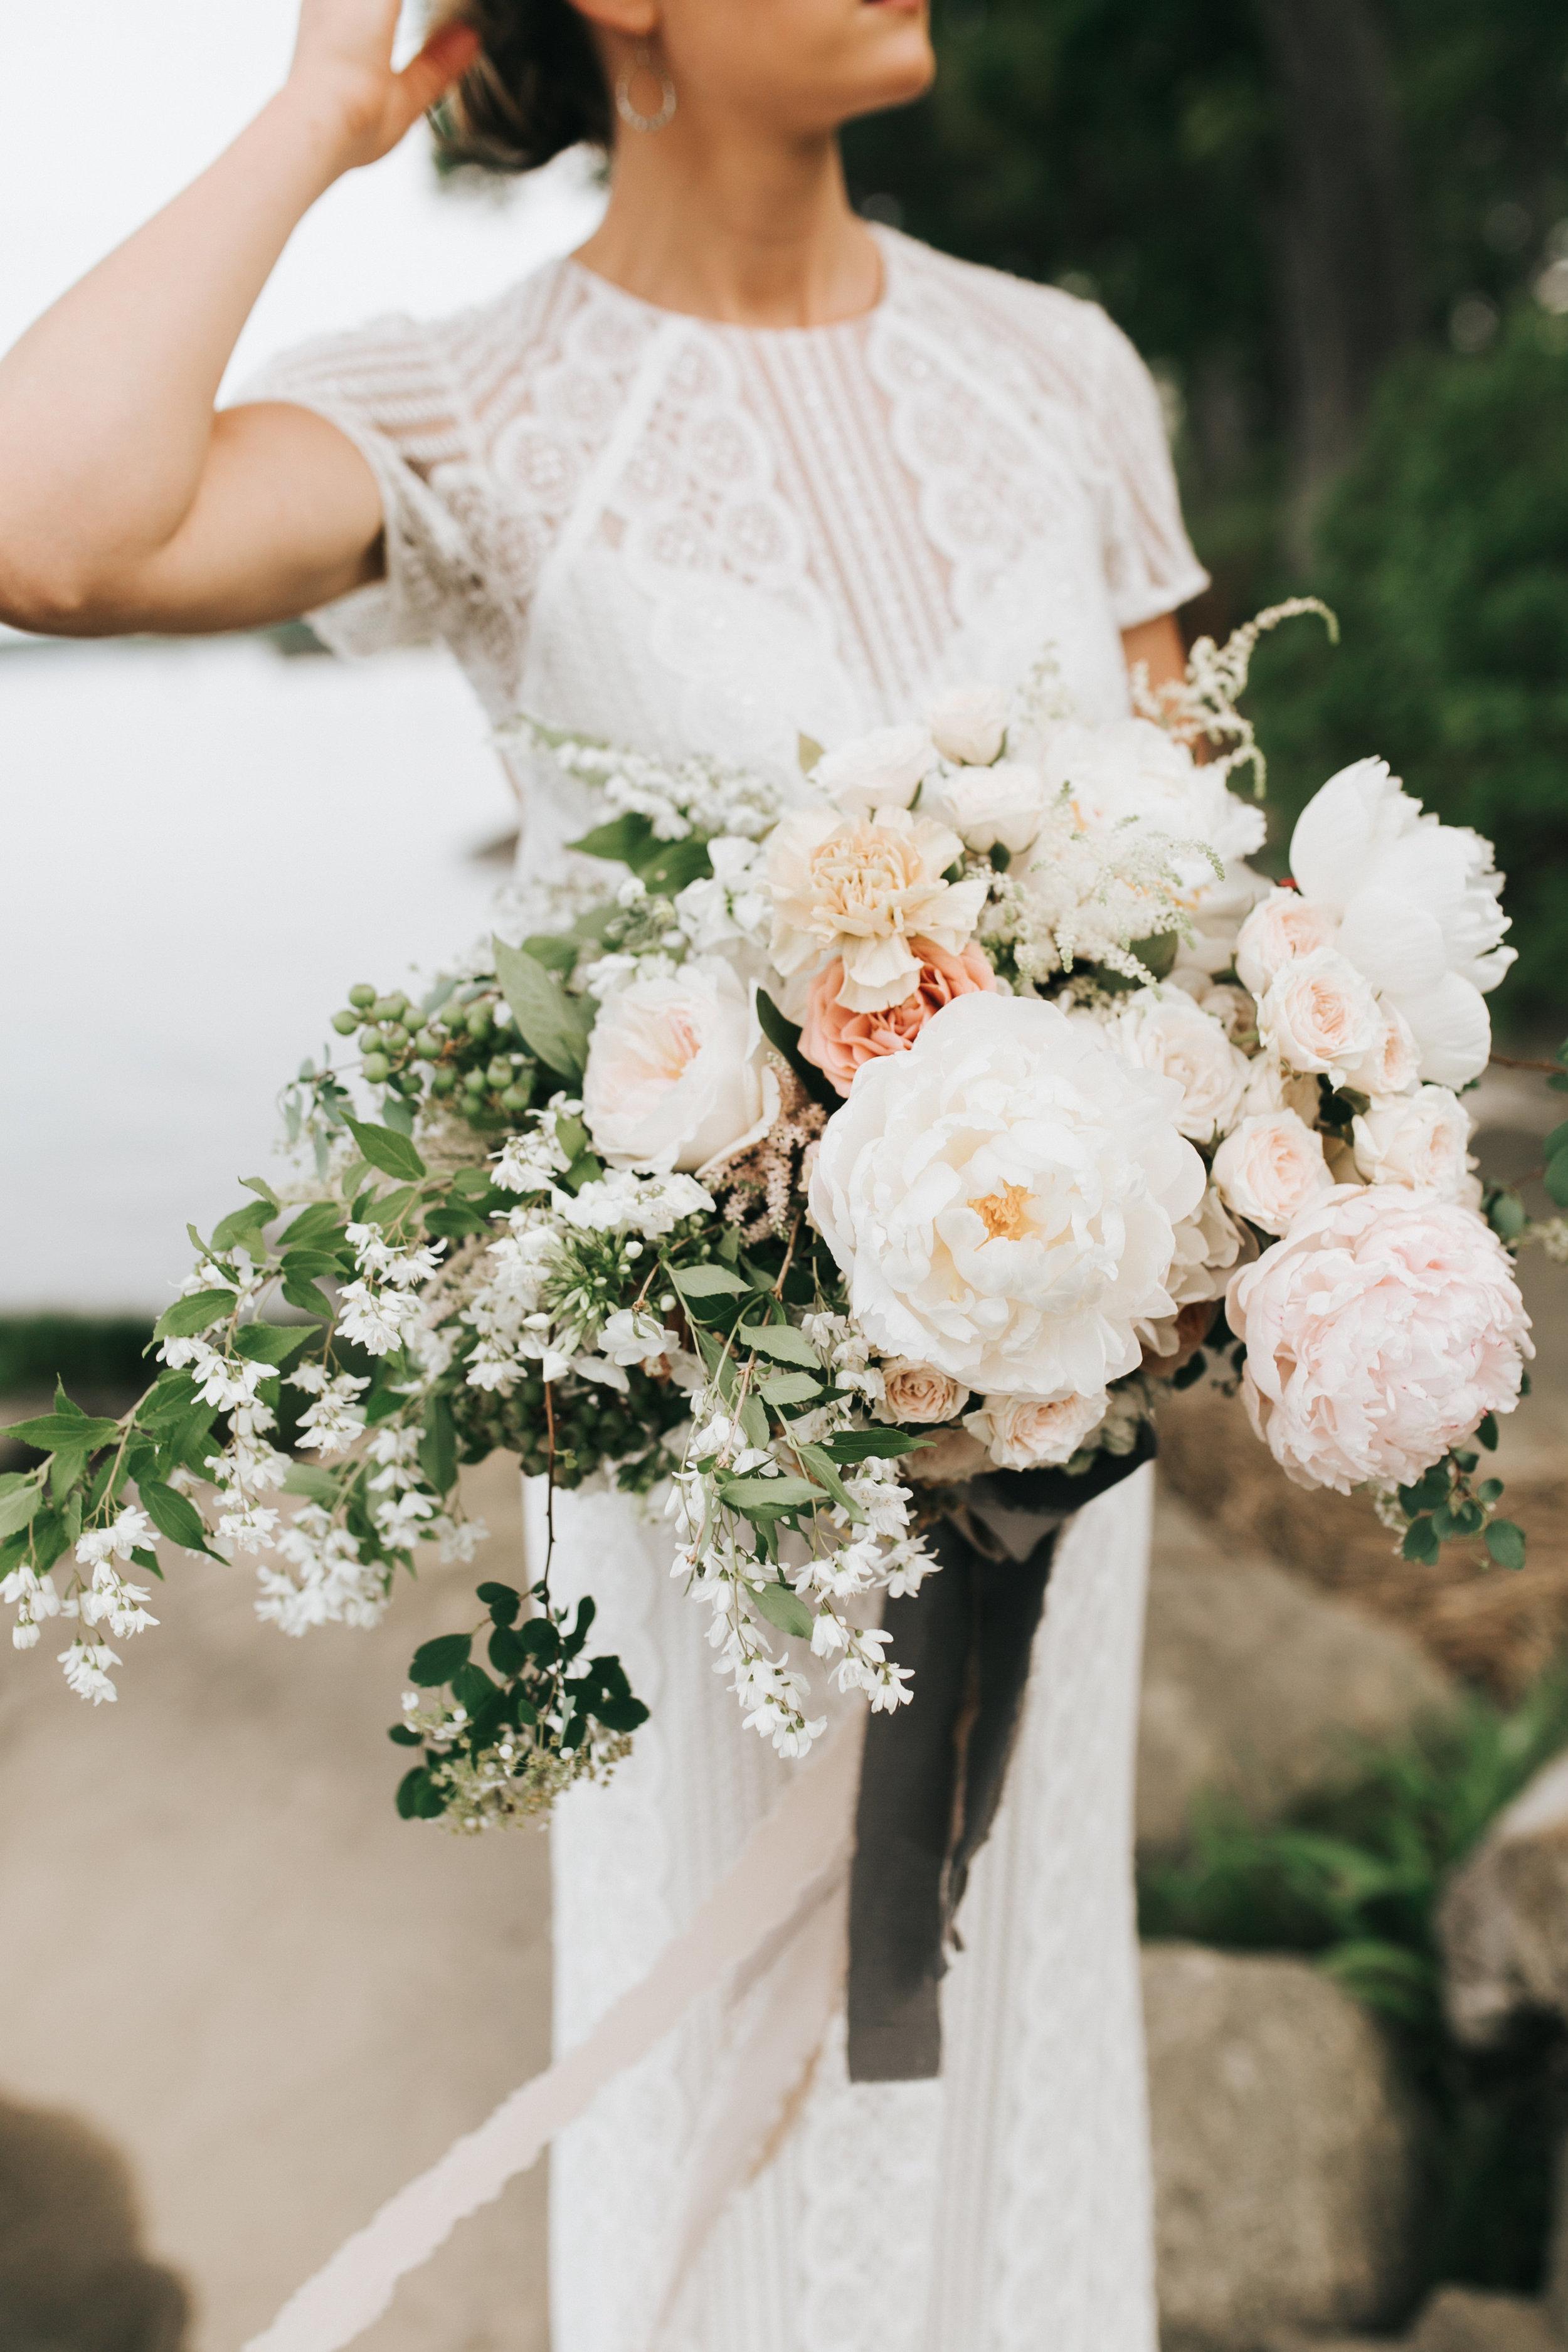 Watershed-Floral-Maine-Maritime-Wedding-Bridal-Bouquet-Centerpieces-0187.jpg